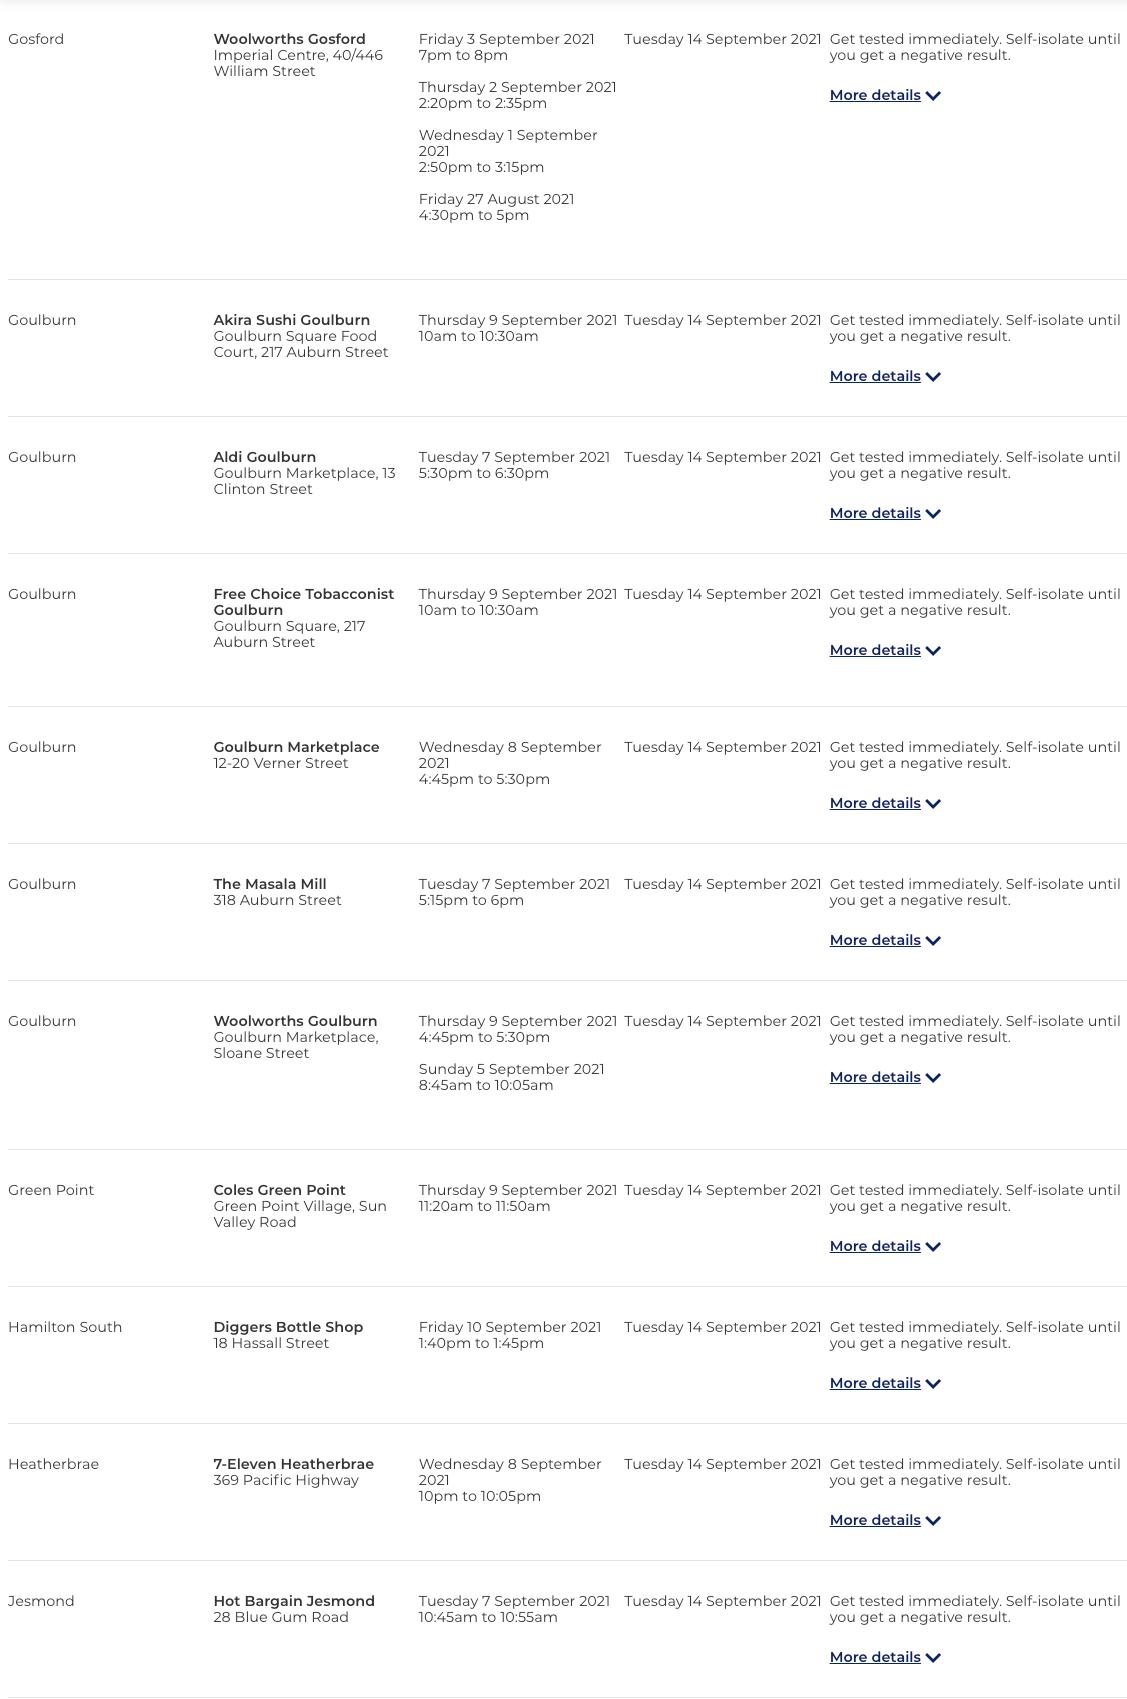 www.nsw.gov.au_covid-19_nsw-covid-19-case-locations_case-locations (34)的副本.png